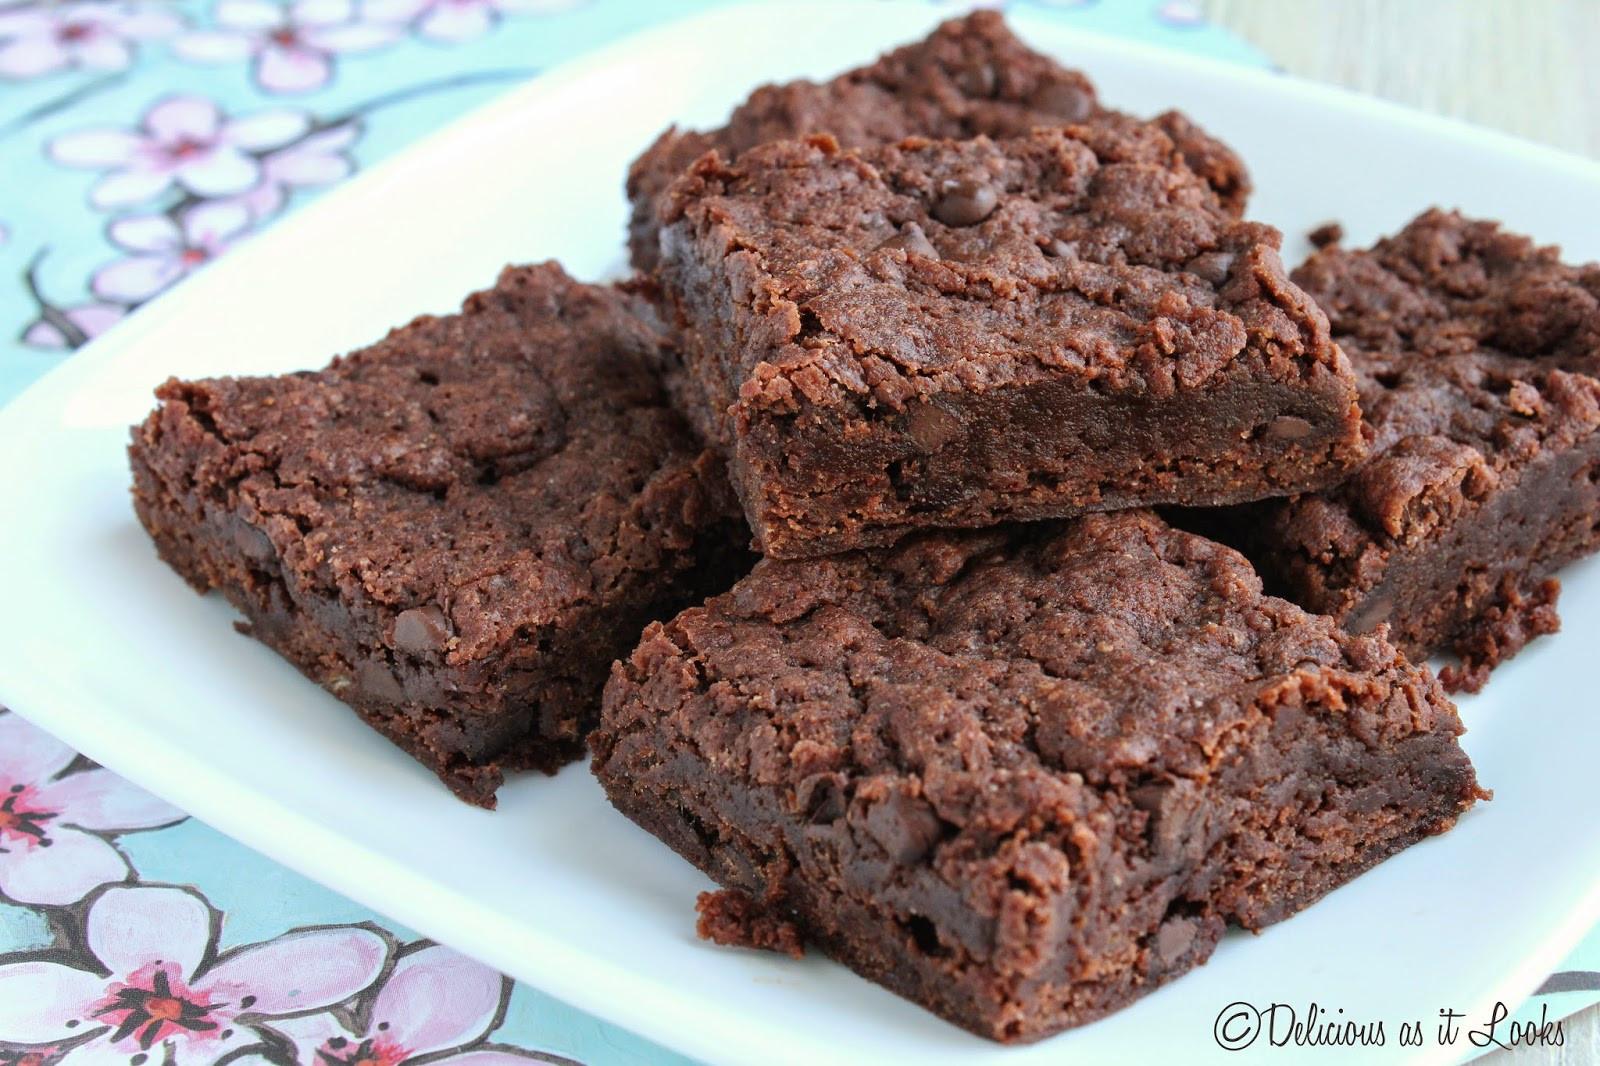 Vegan Fudge Brownies  Delicious as it Looks Fudge Brownies Gluten Free Vegan